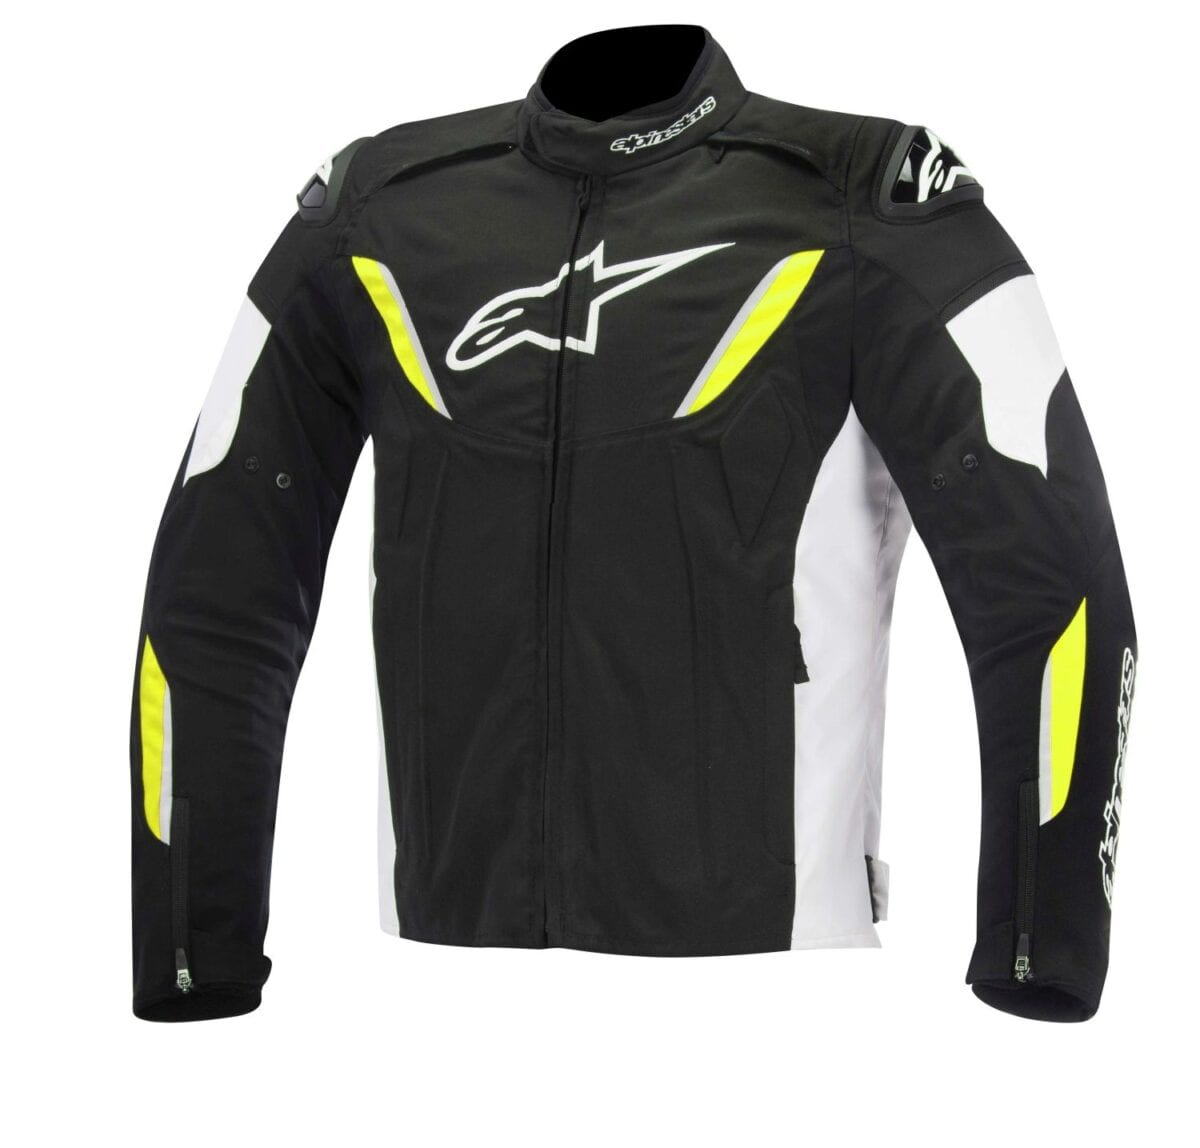 Alpinestars-TGP-R-jacketlores